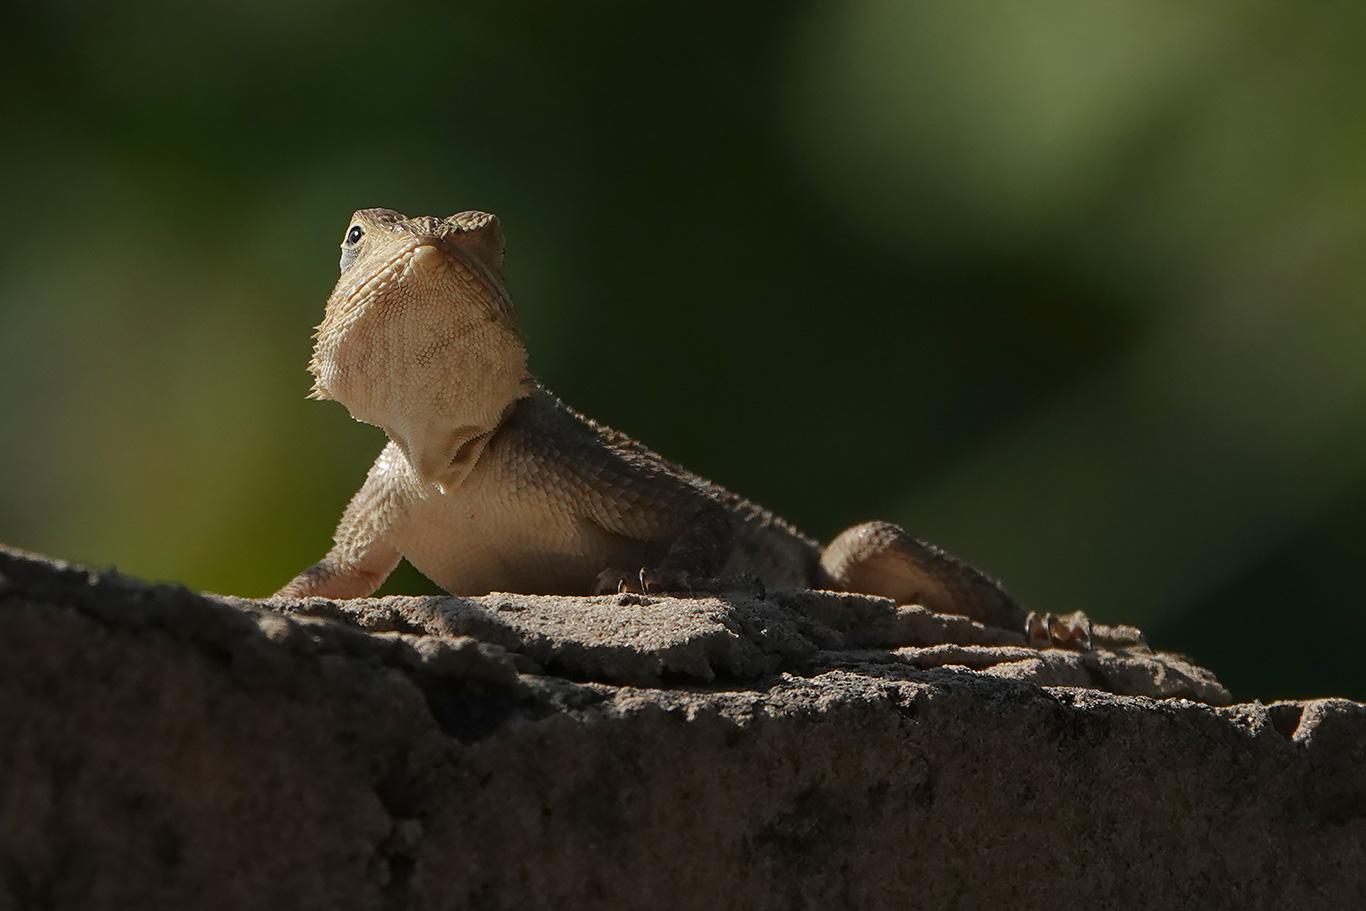 Lizard sp., Tujereng, The Gambia.